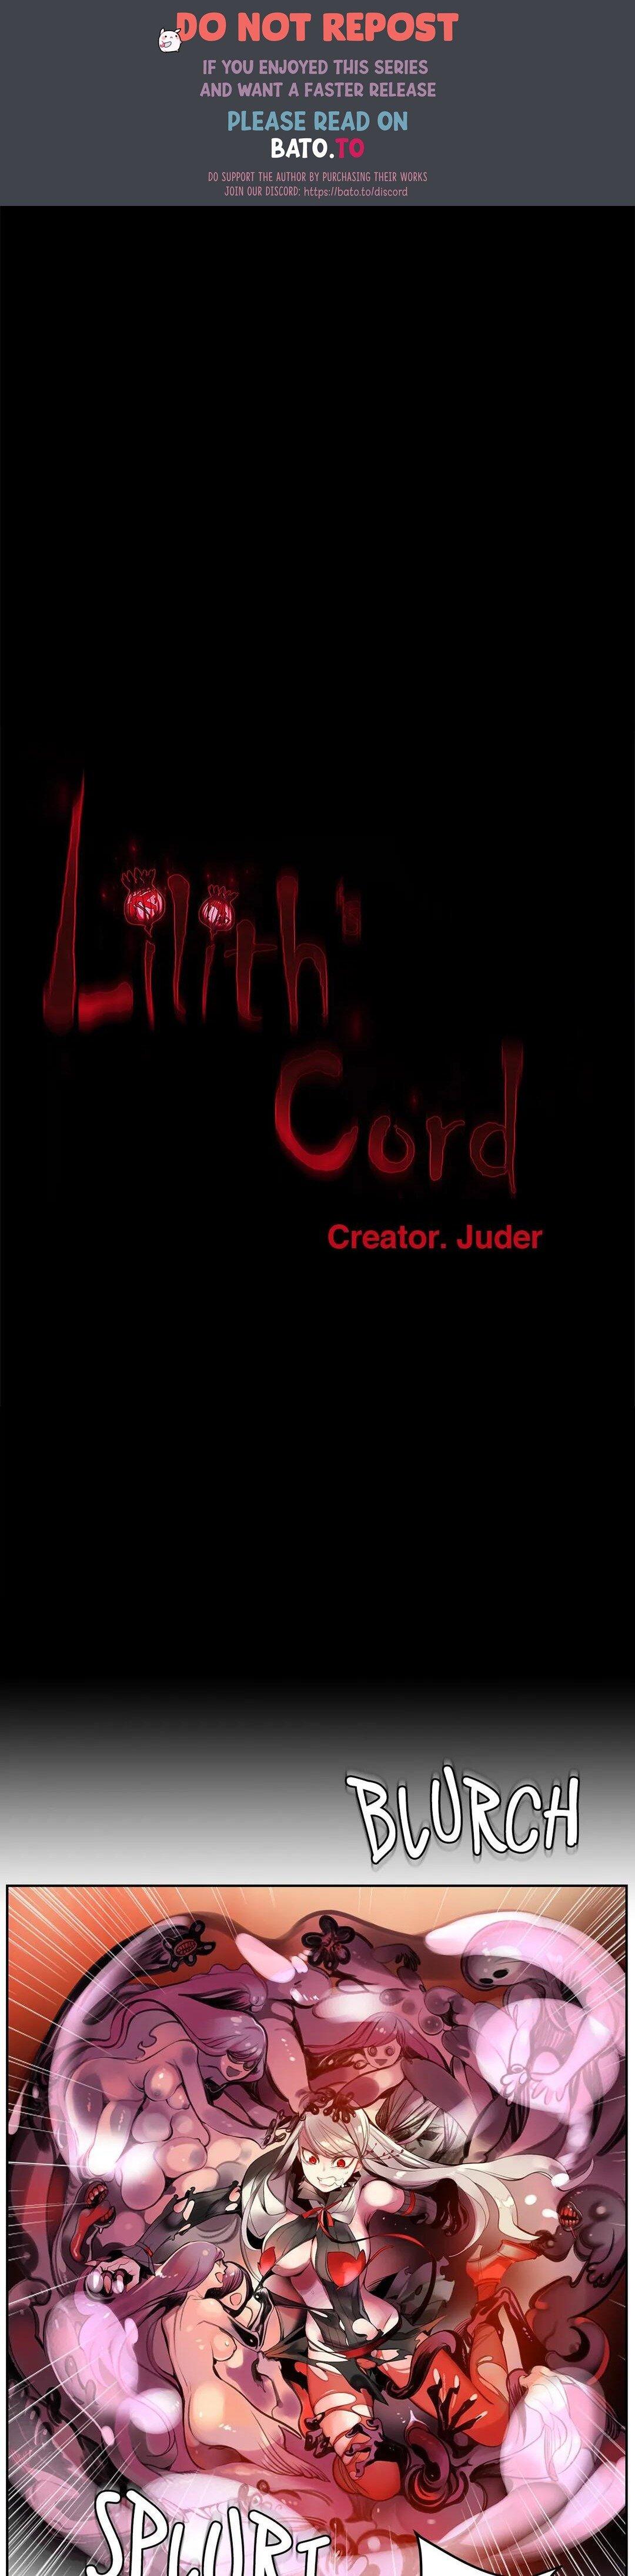 Manga Lilith's Cord - Chapter 68 Page 1